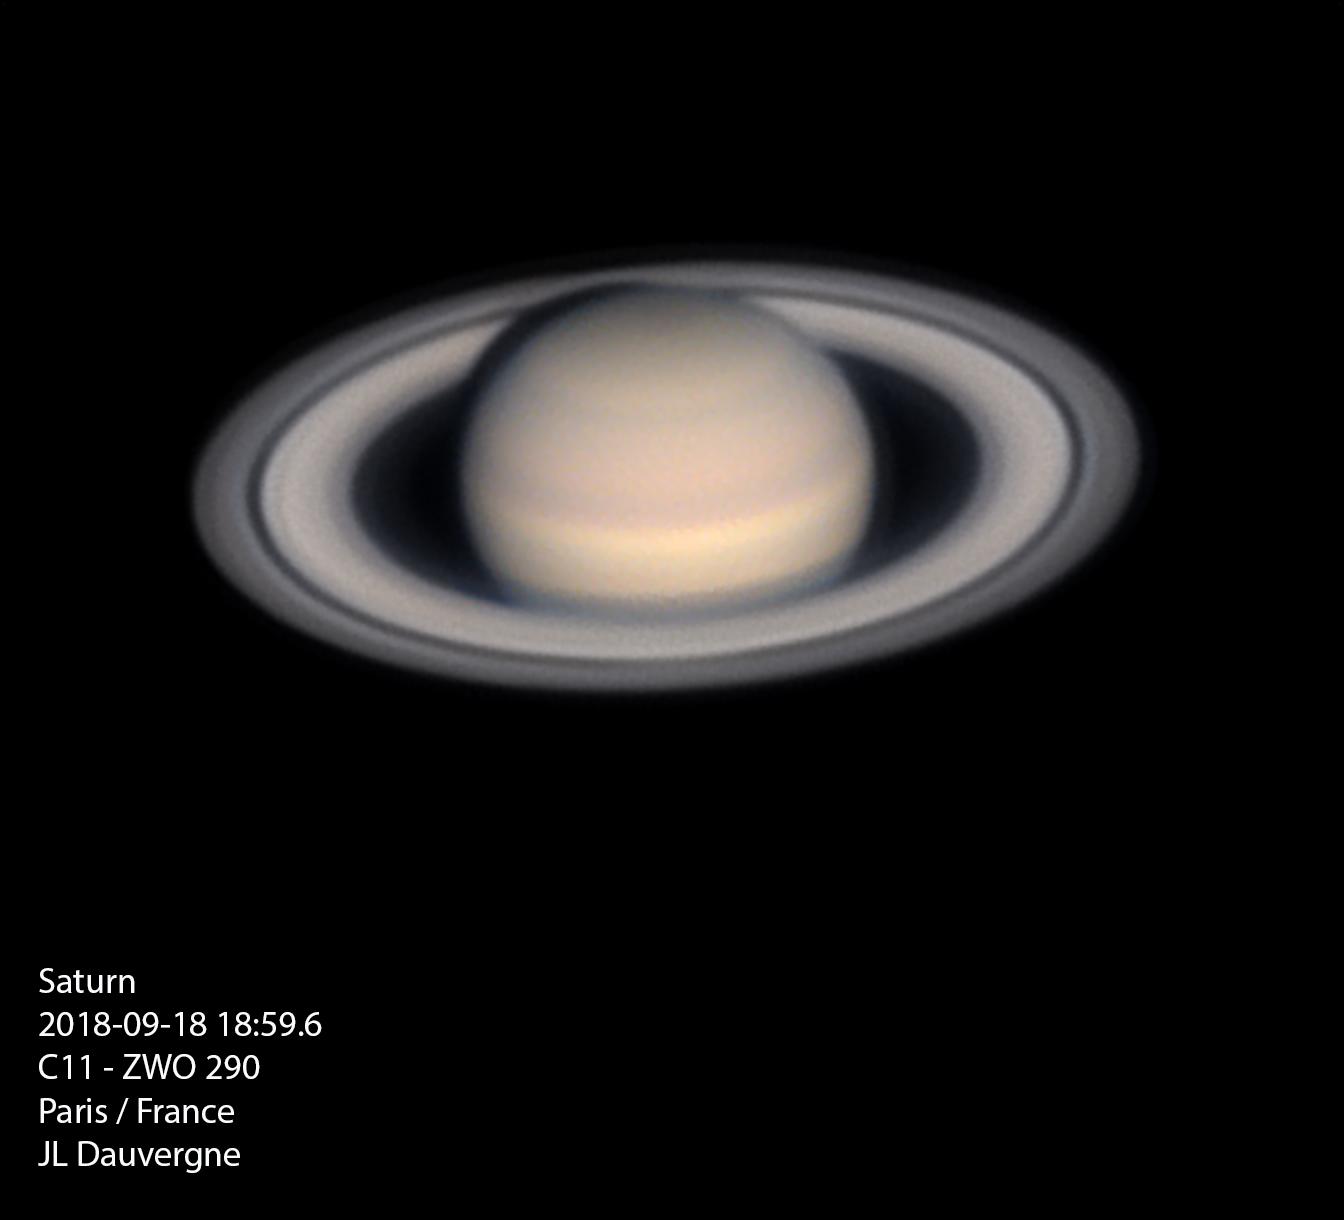 5c6fba40bbf05_2018-09-19-1859_6-R-Saturn_ZWOASI290MMMini_lapl6_ap155.png.4bc11e18fdfe7e2128f984b7d4454cef.png